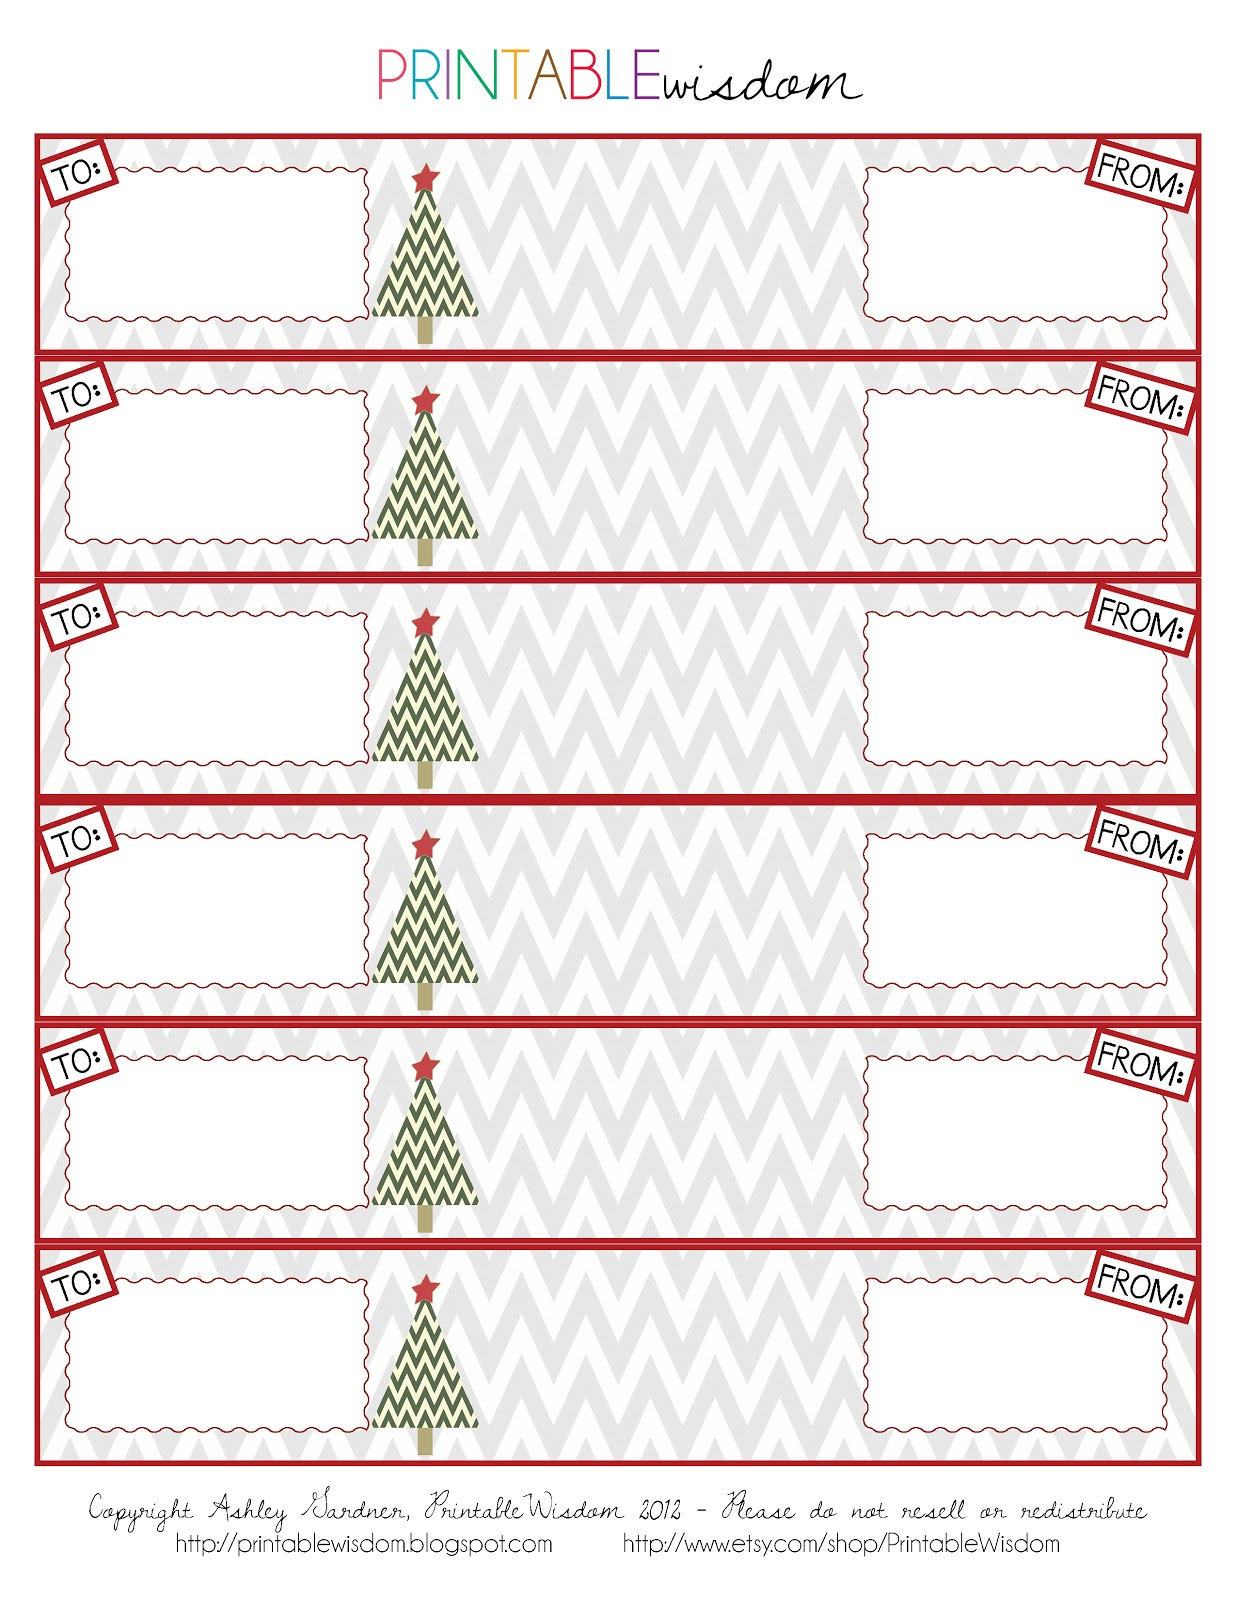 012 Template Ideas Address Label Templates Free Printable Christmas - Free Printable Christmas Return Address Label Template